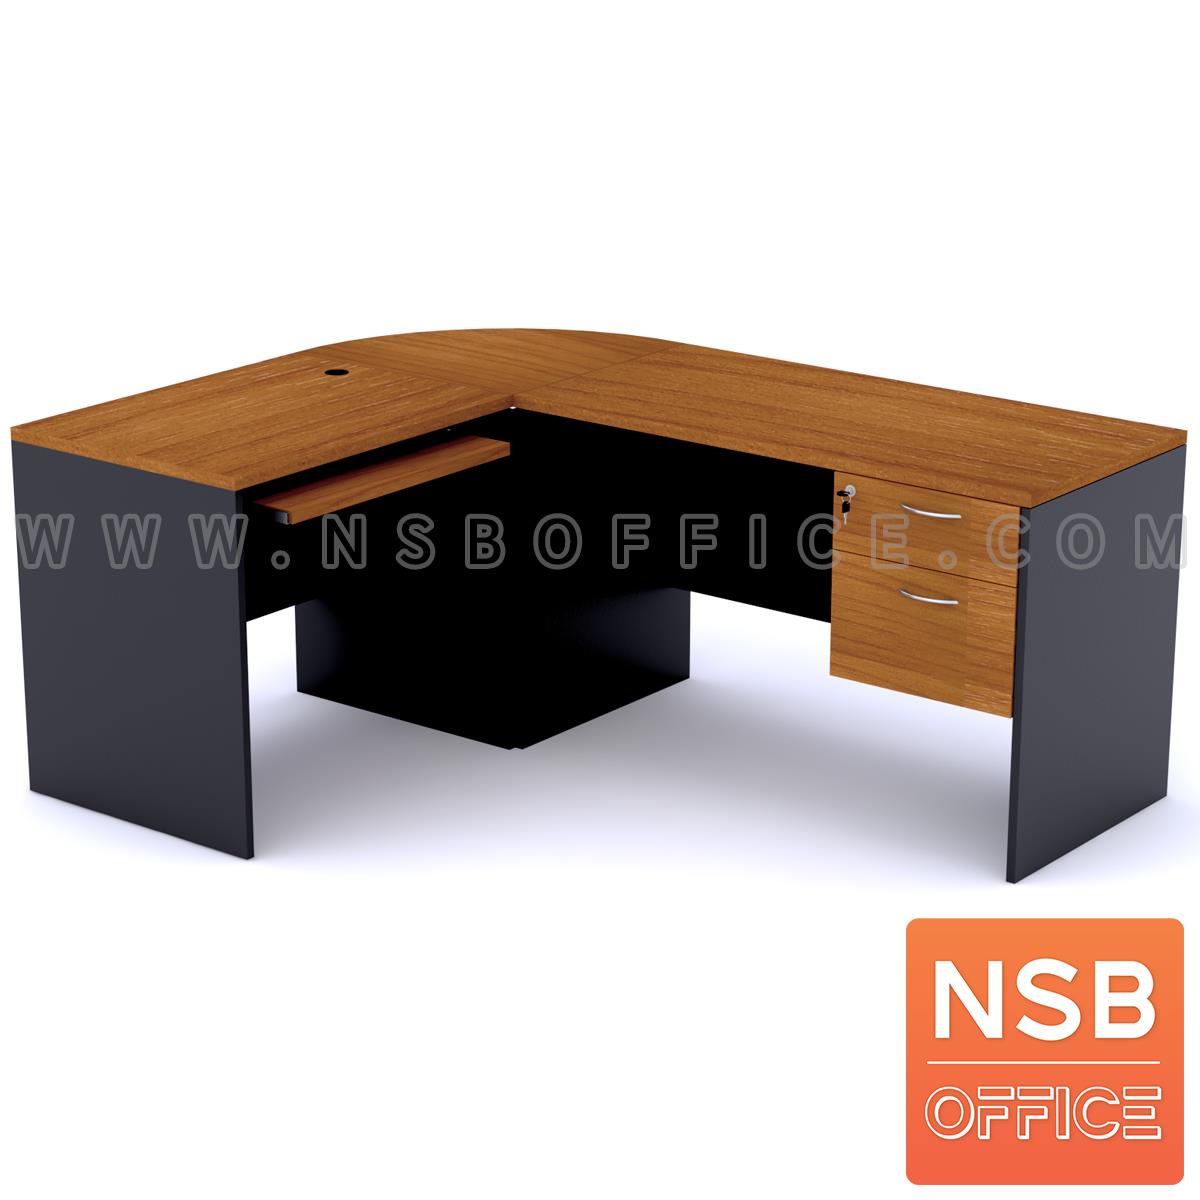 A12A019:โต๊ะทำงานตัวแอล ชุด 2+1 ชิ้น รุ่น Richard (ริชาร์ด) ขนาด 180W1*140W2 cm. เมลามีน